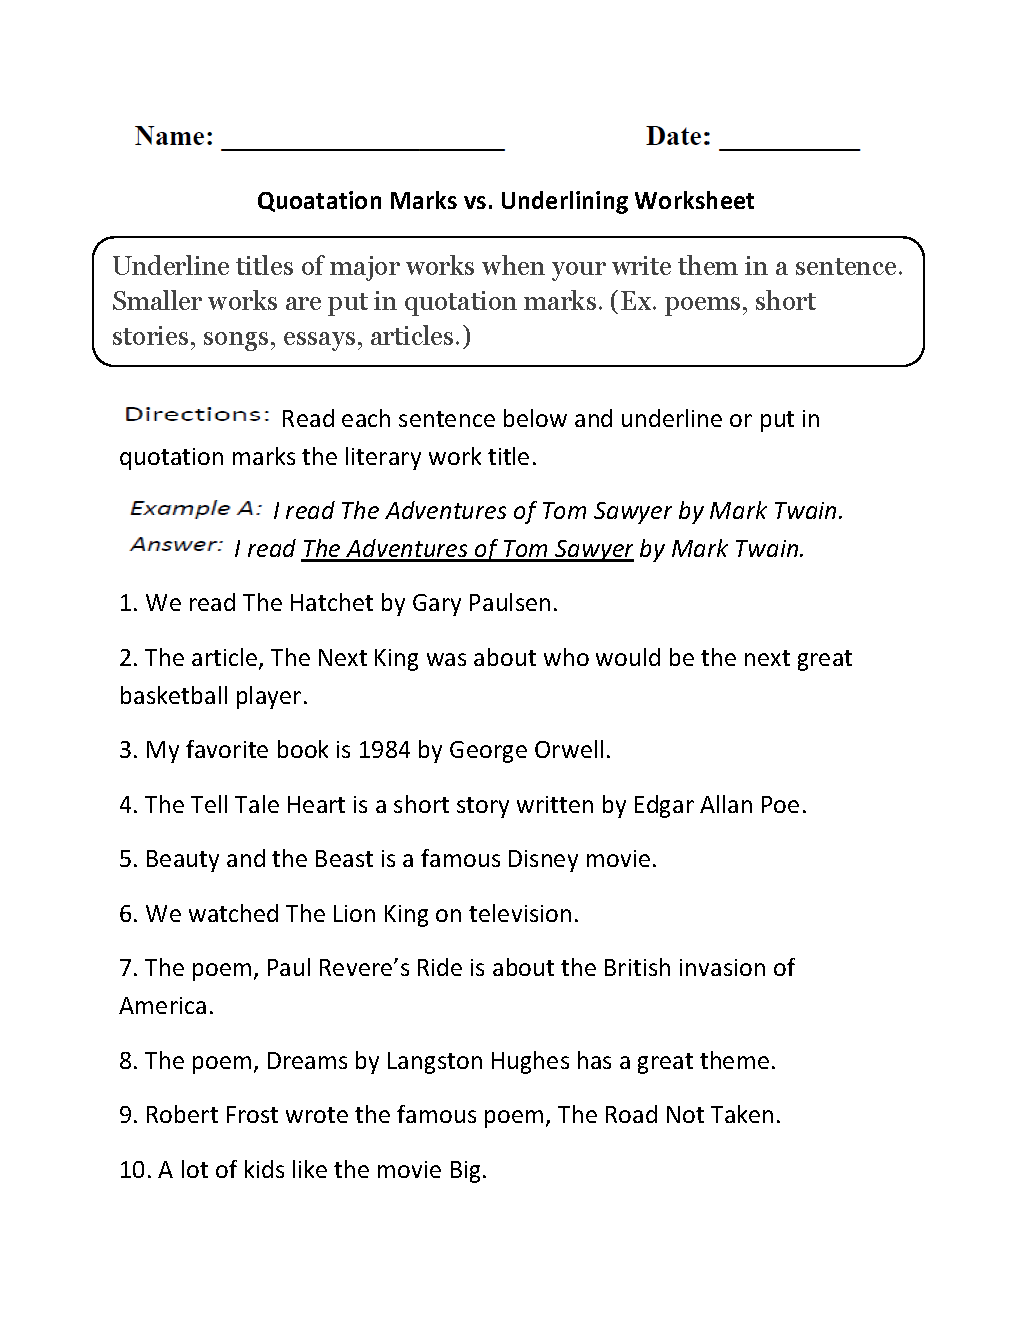 Grammar Mechanics Worksheets   Italics and Underlining Worksheets    Punctuation worksheets [ 1331 x 1012 Pixel ]